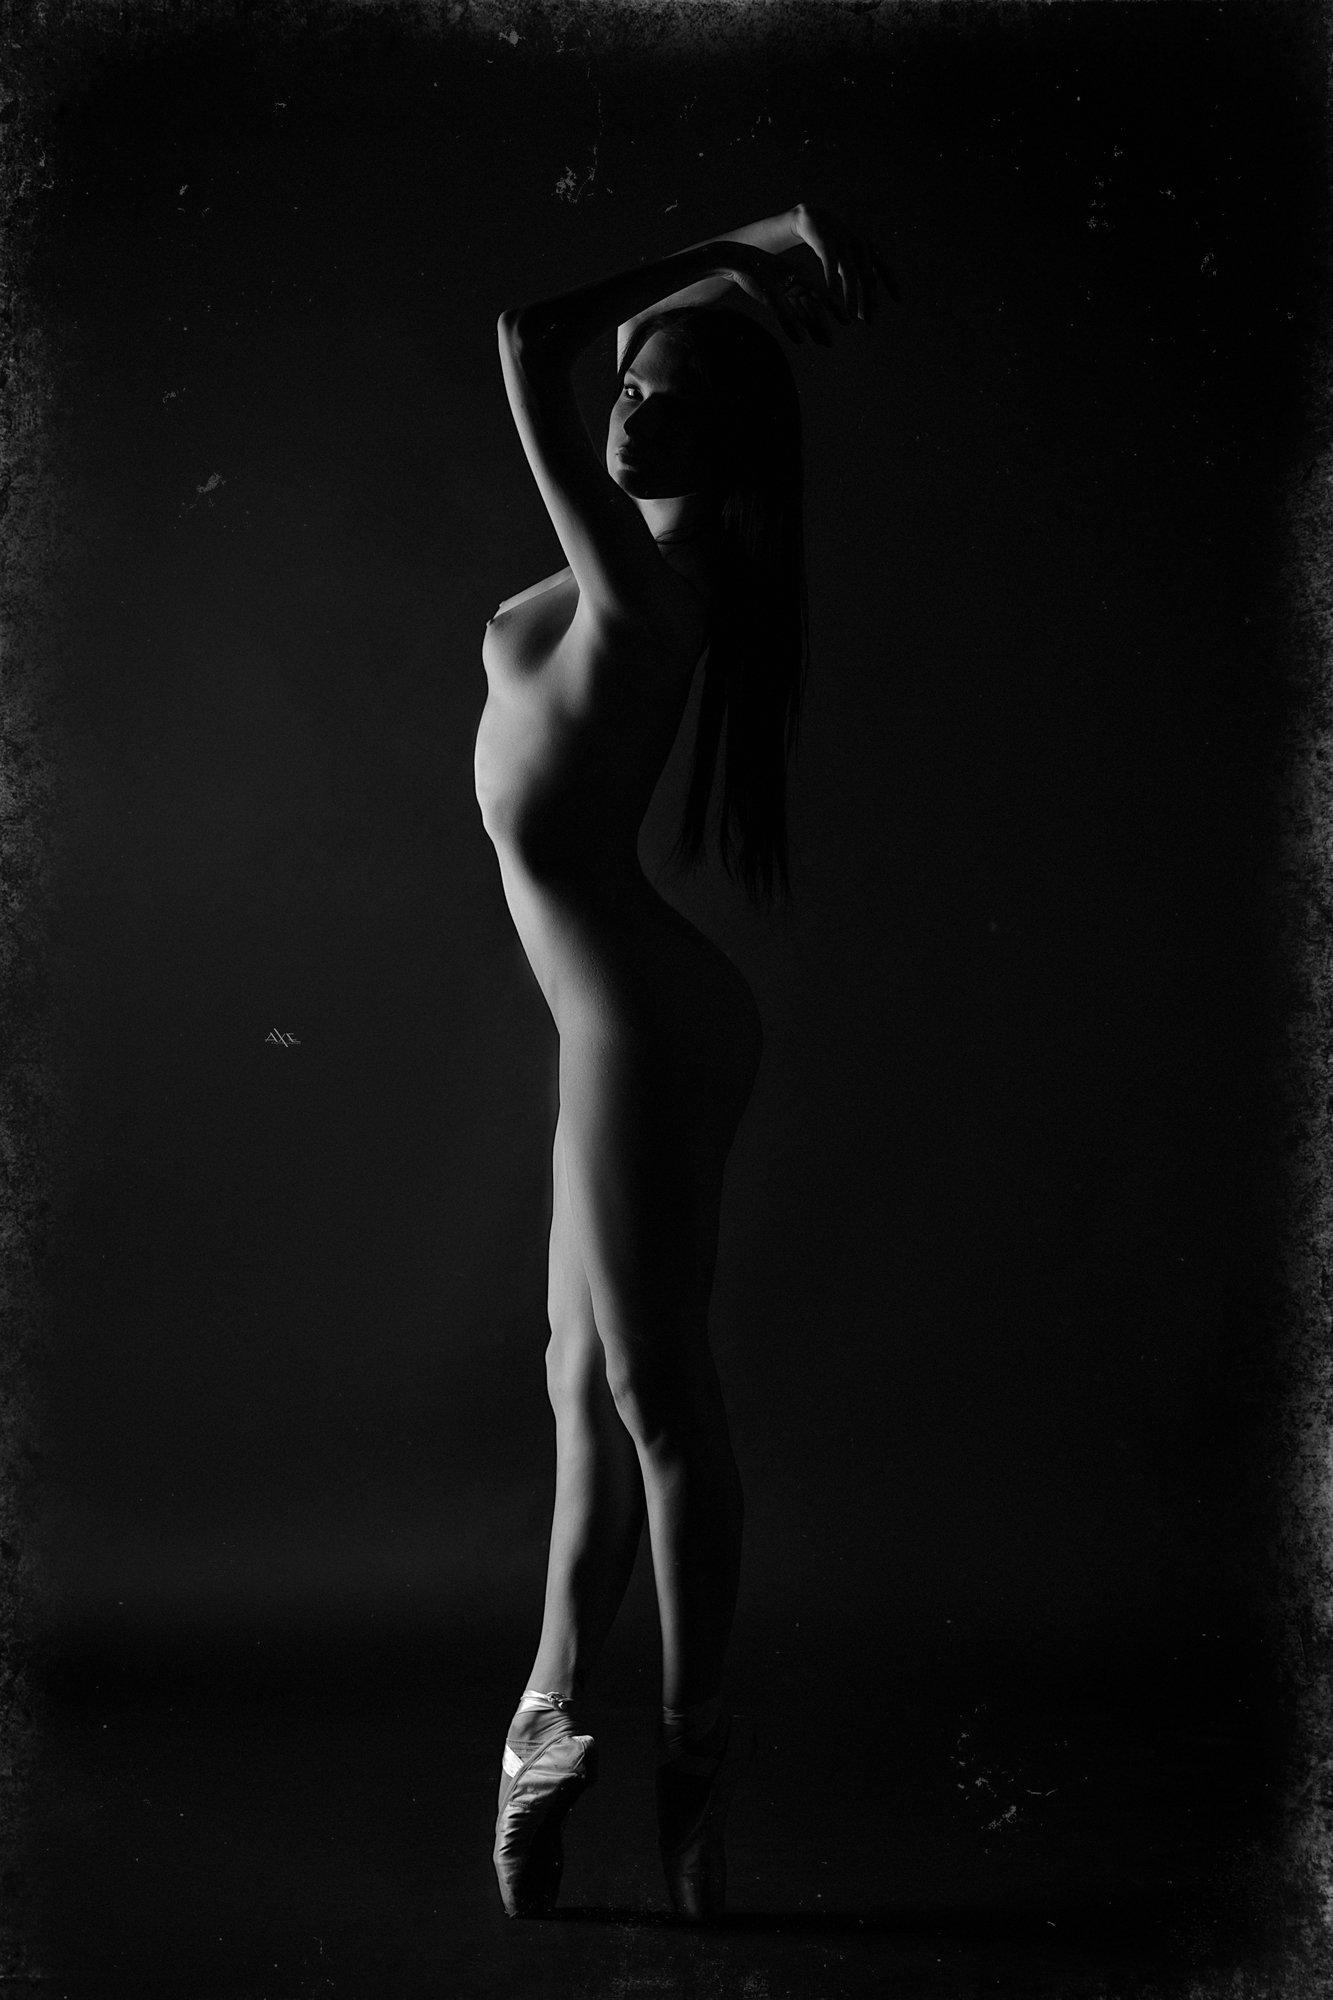 woman, art, portrait, nude, ballerina, studio, blackandwhite, Руслан Болгов (Axe)